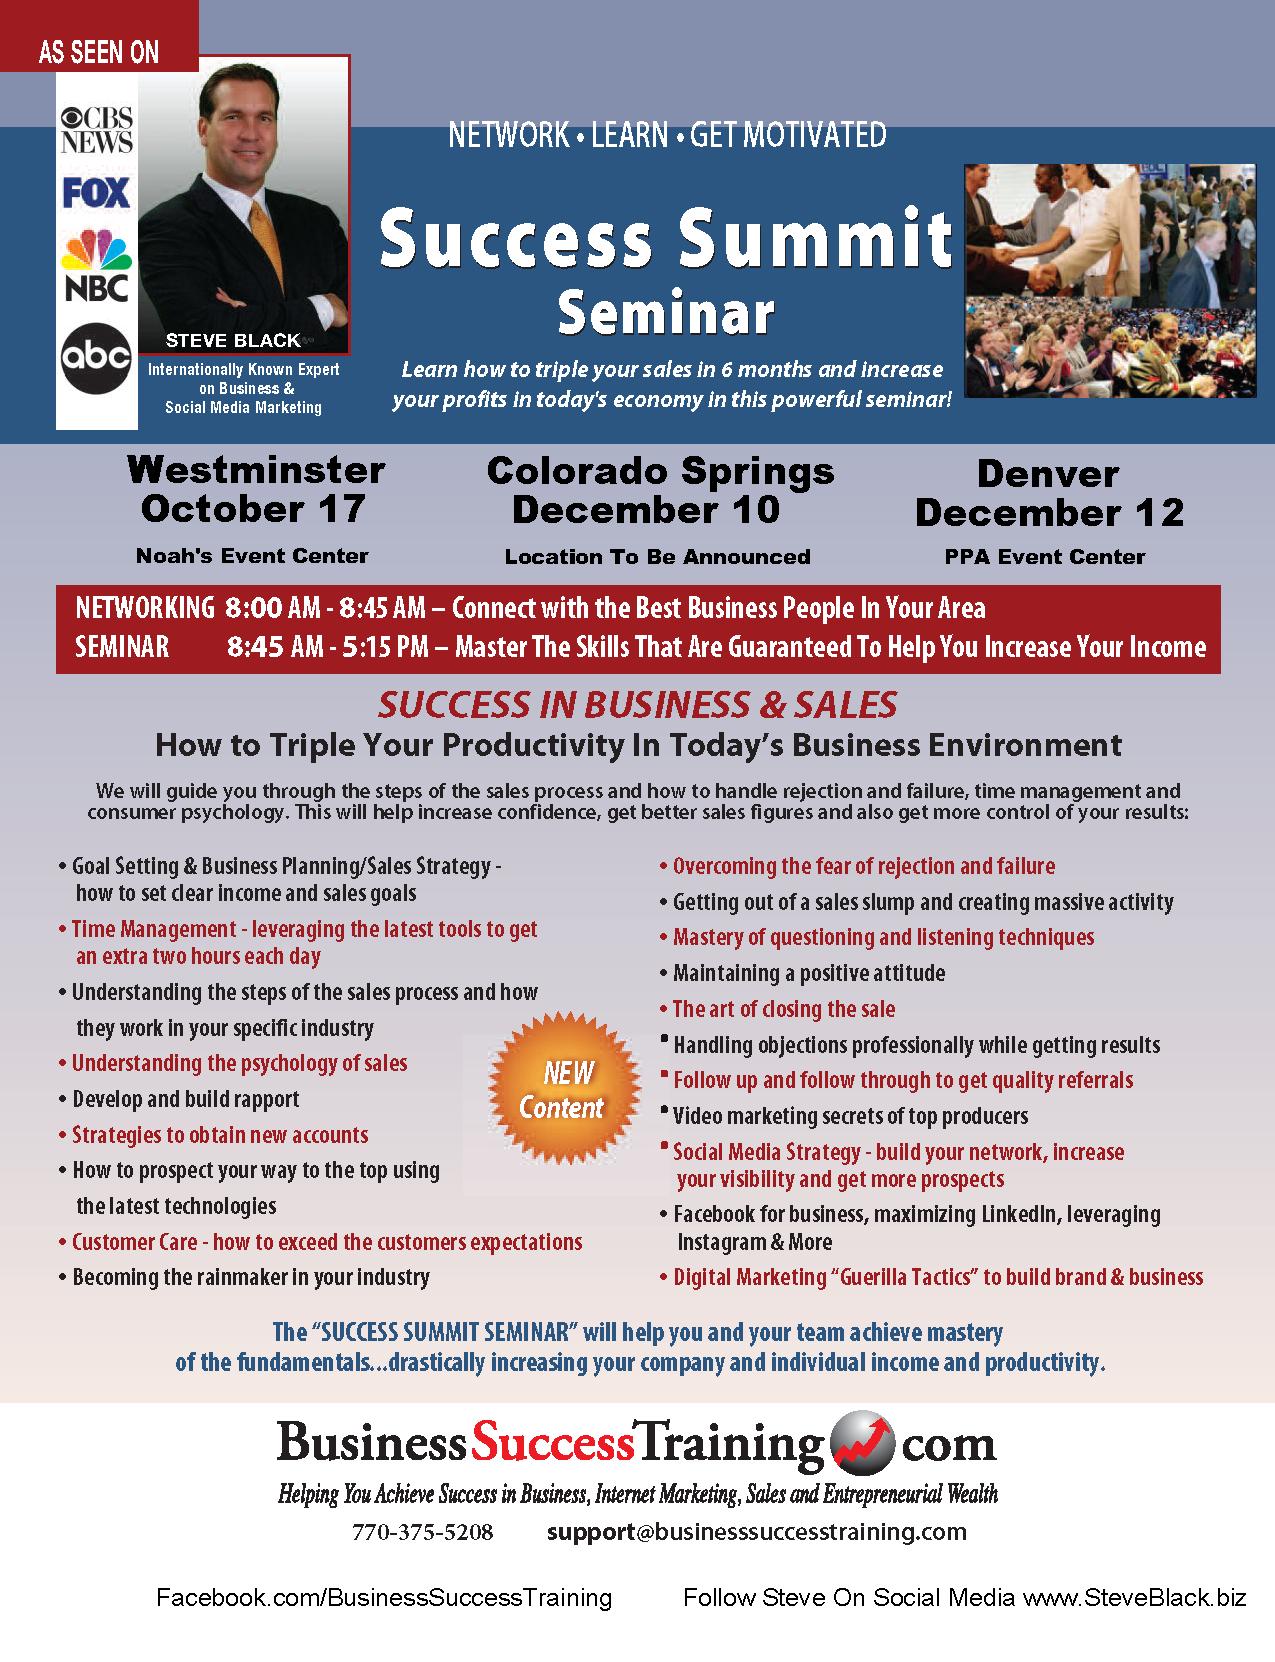 RSVP Success Summit Seminar